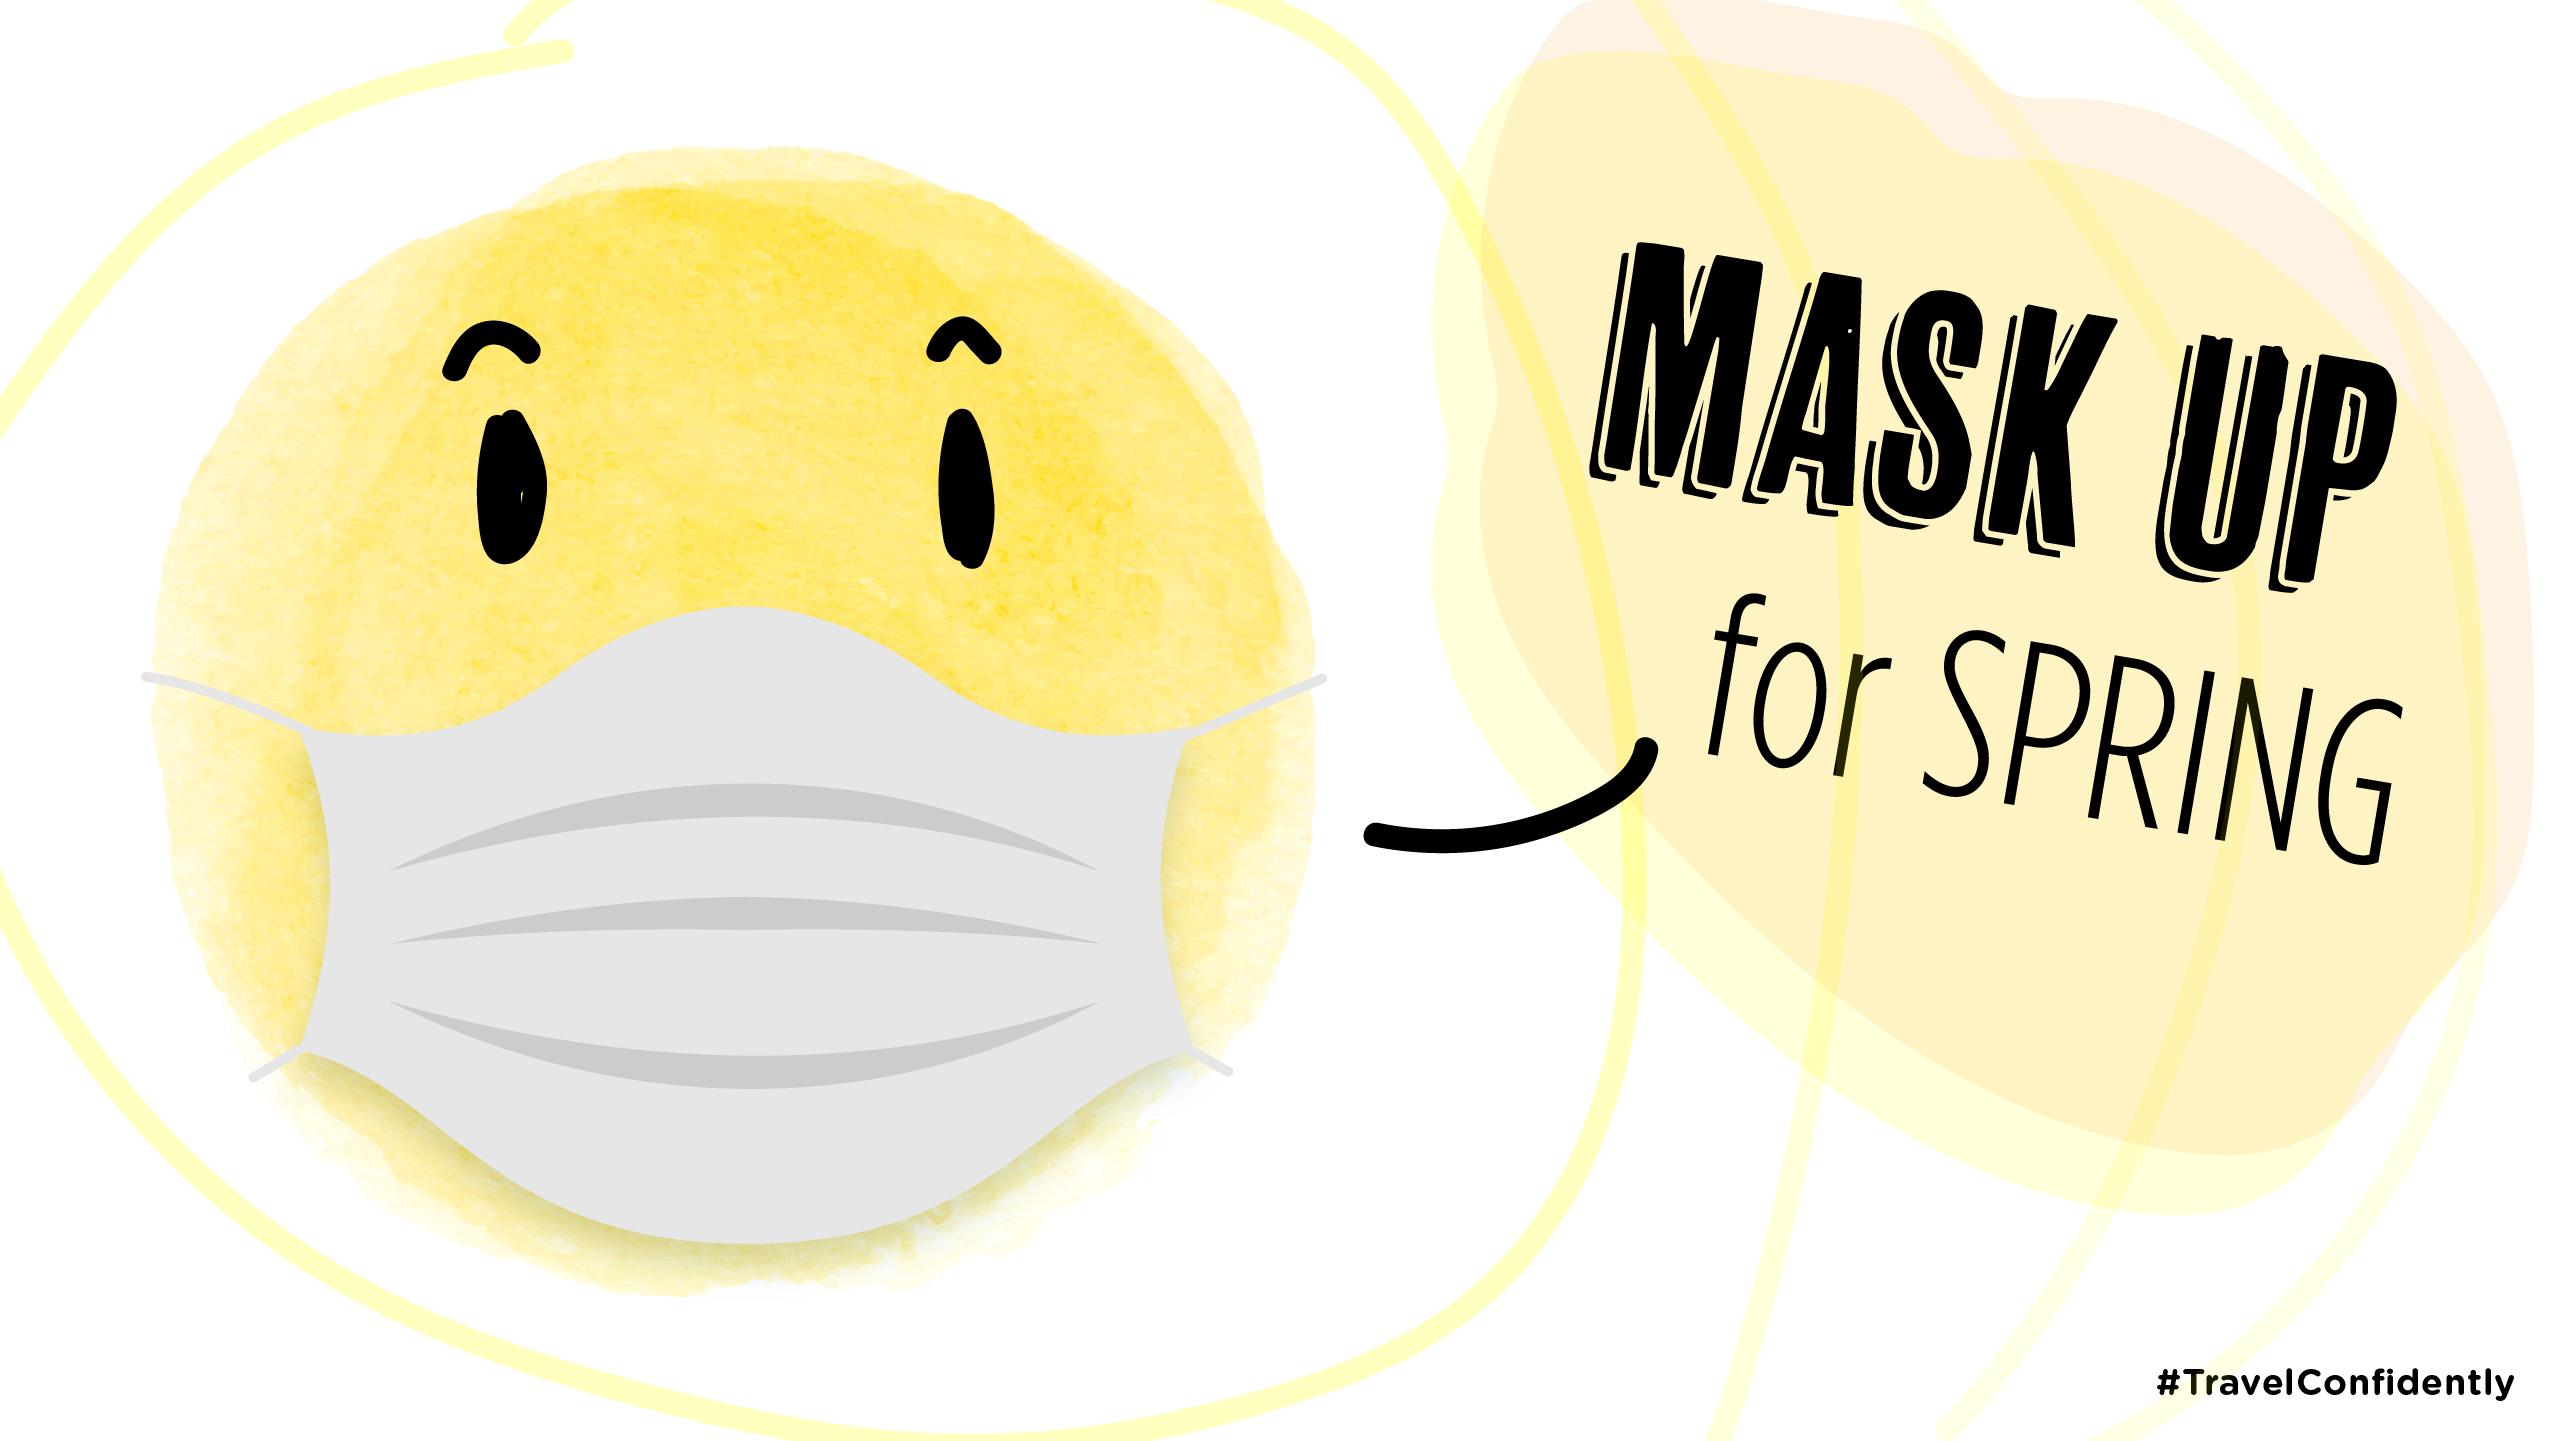 Mask up for spring.